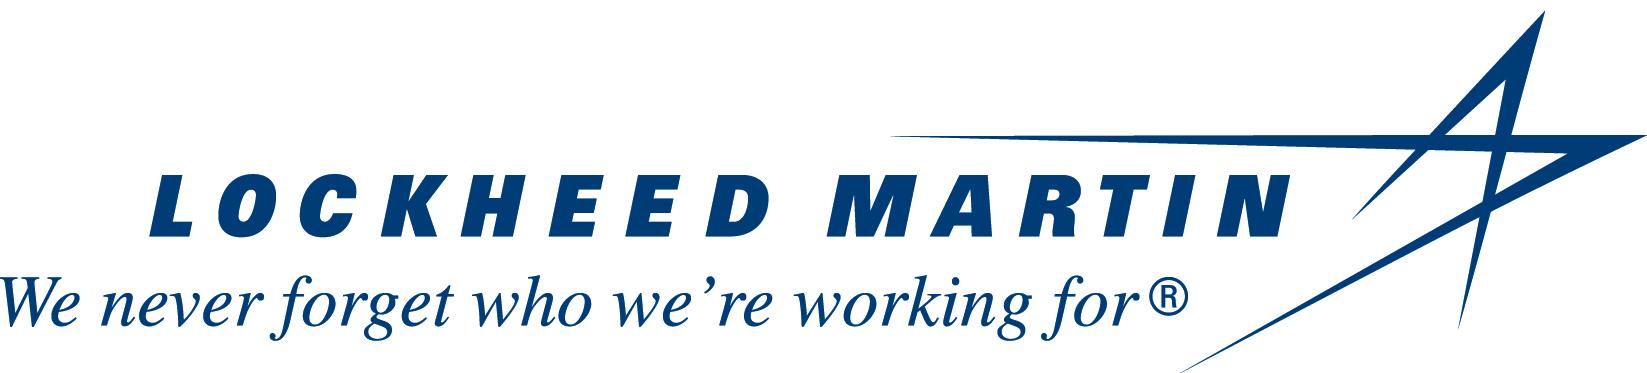 LM logo tagline blue